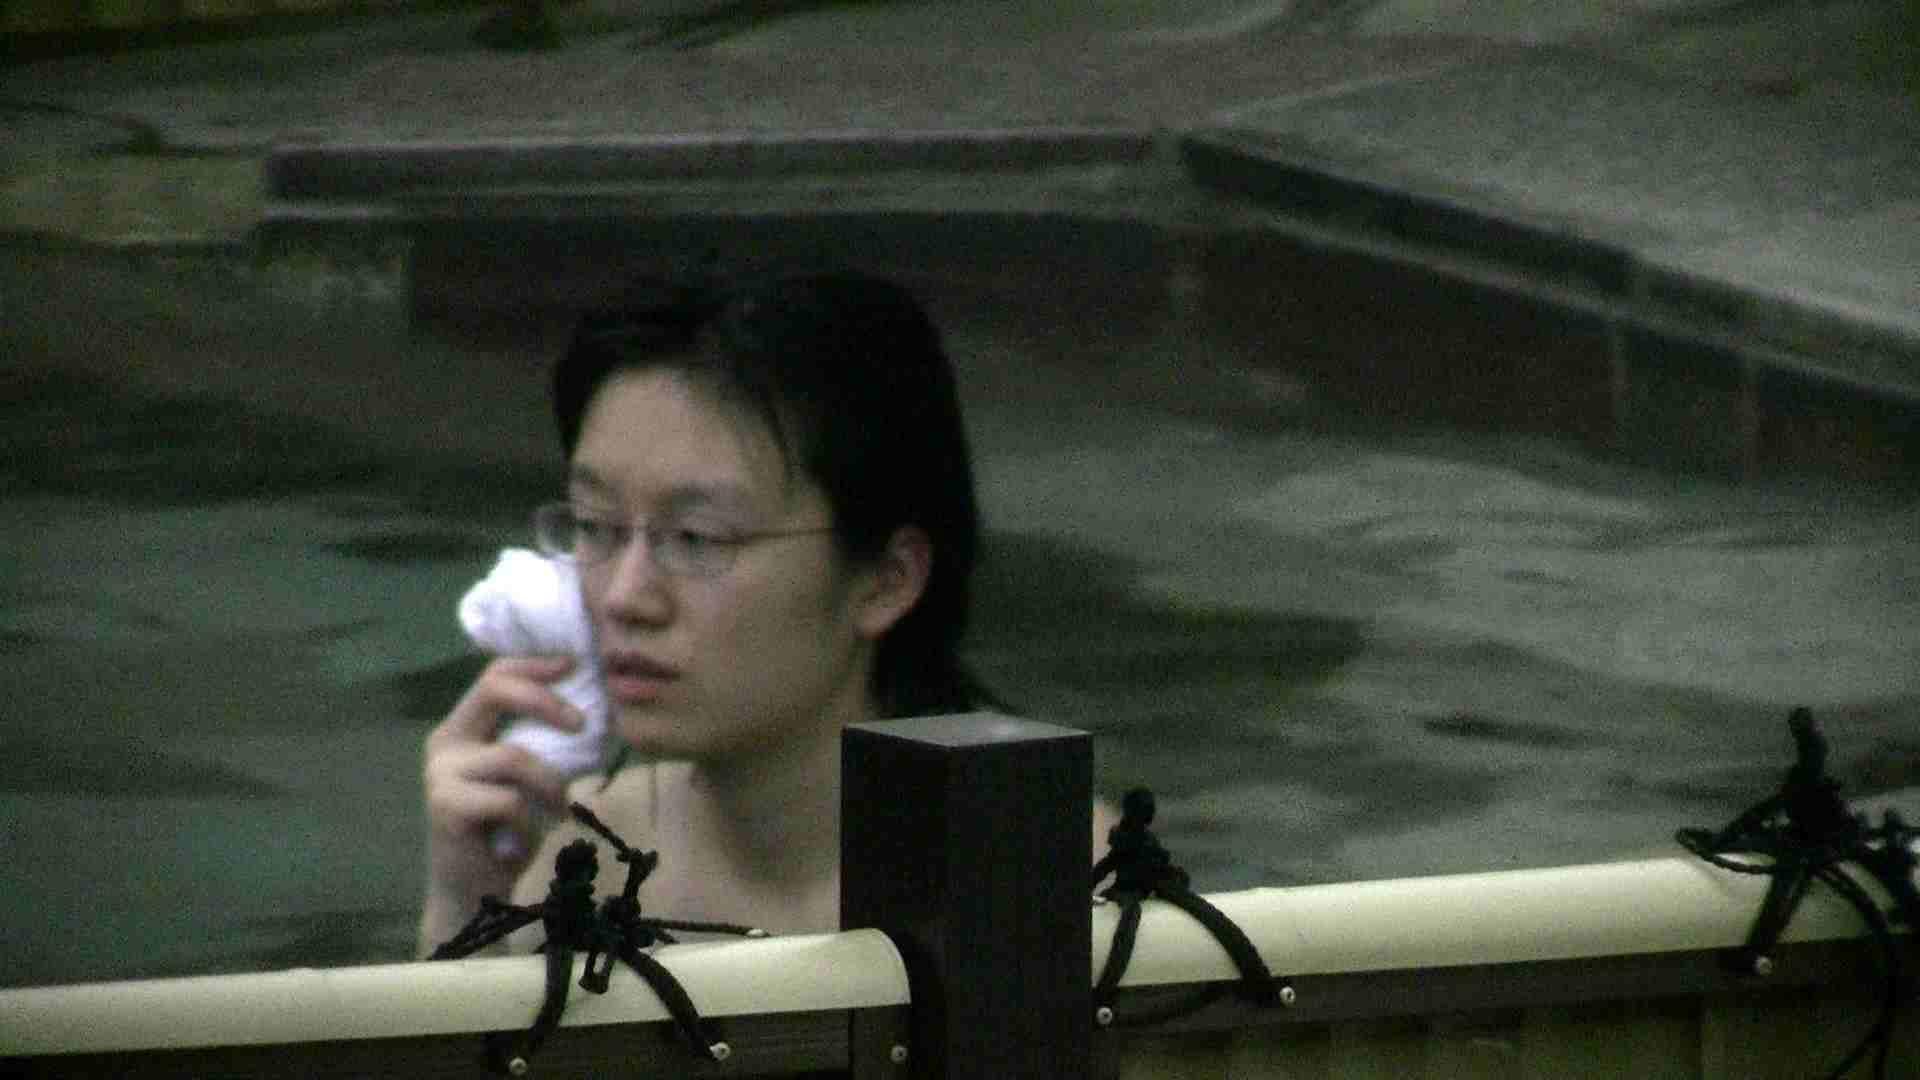 Aquaな露天風呂Vol.684 OLのエロ生活   露天風呂  59連発 22